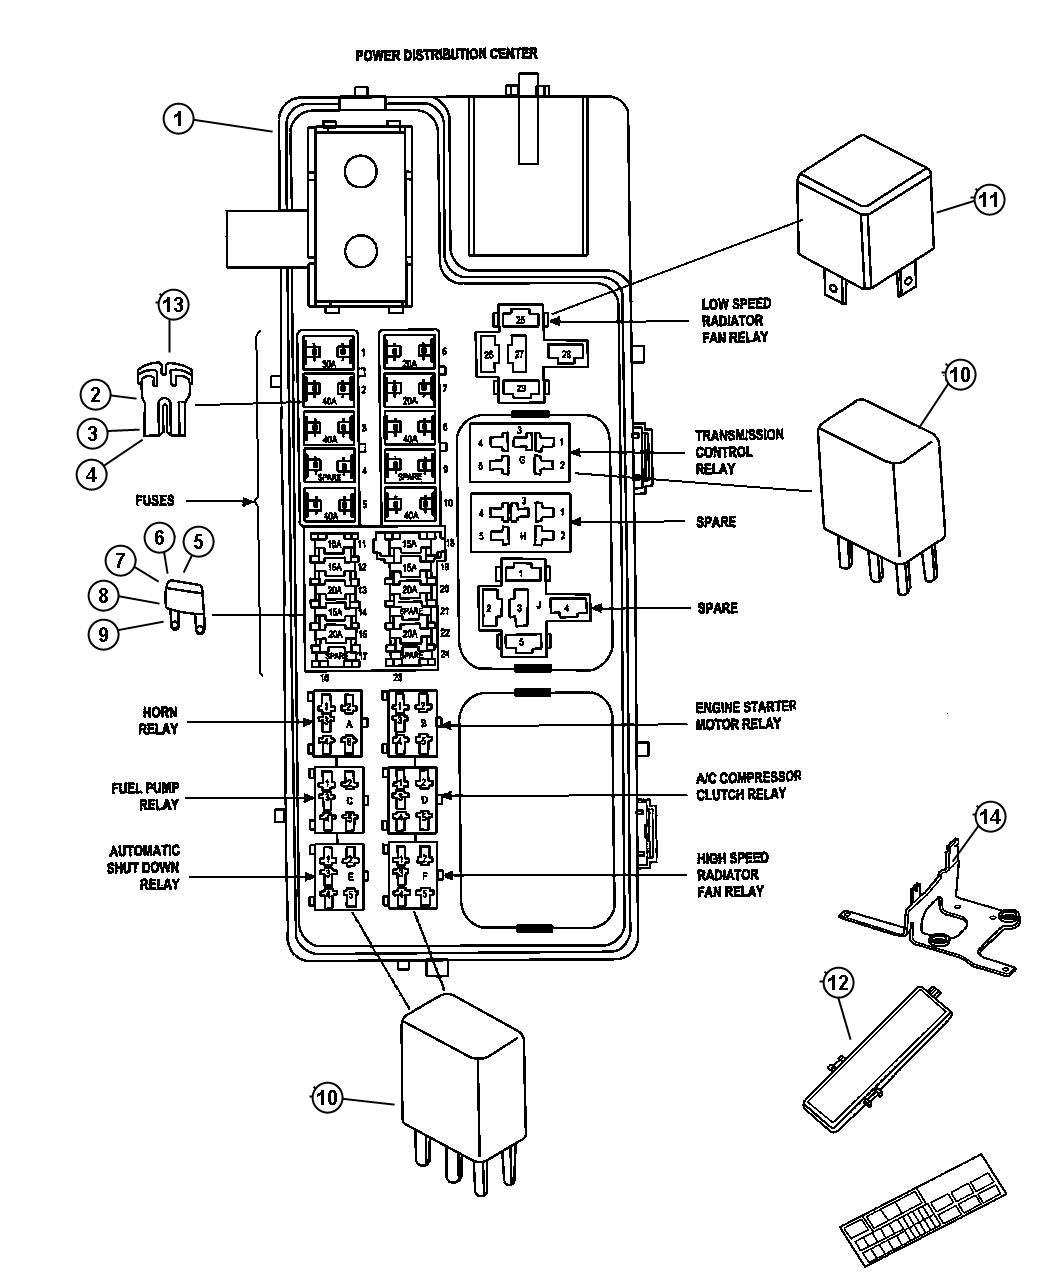 5l3t aa relay diagram wiring diagram database jeep relay mini radiator fan